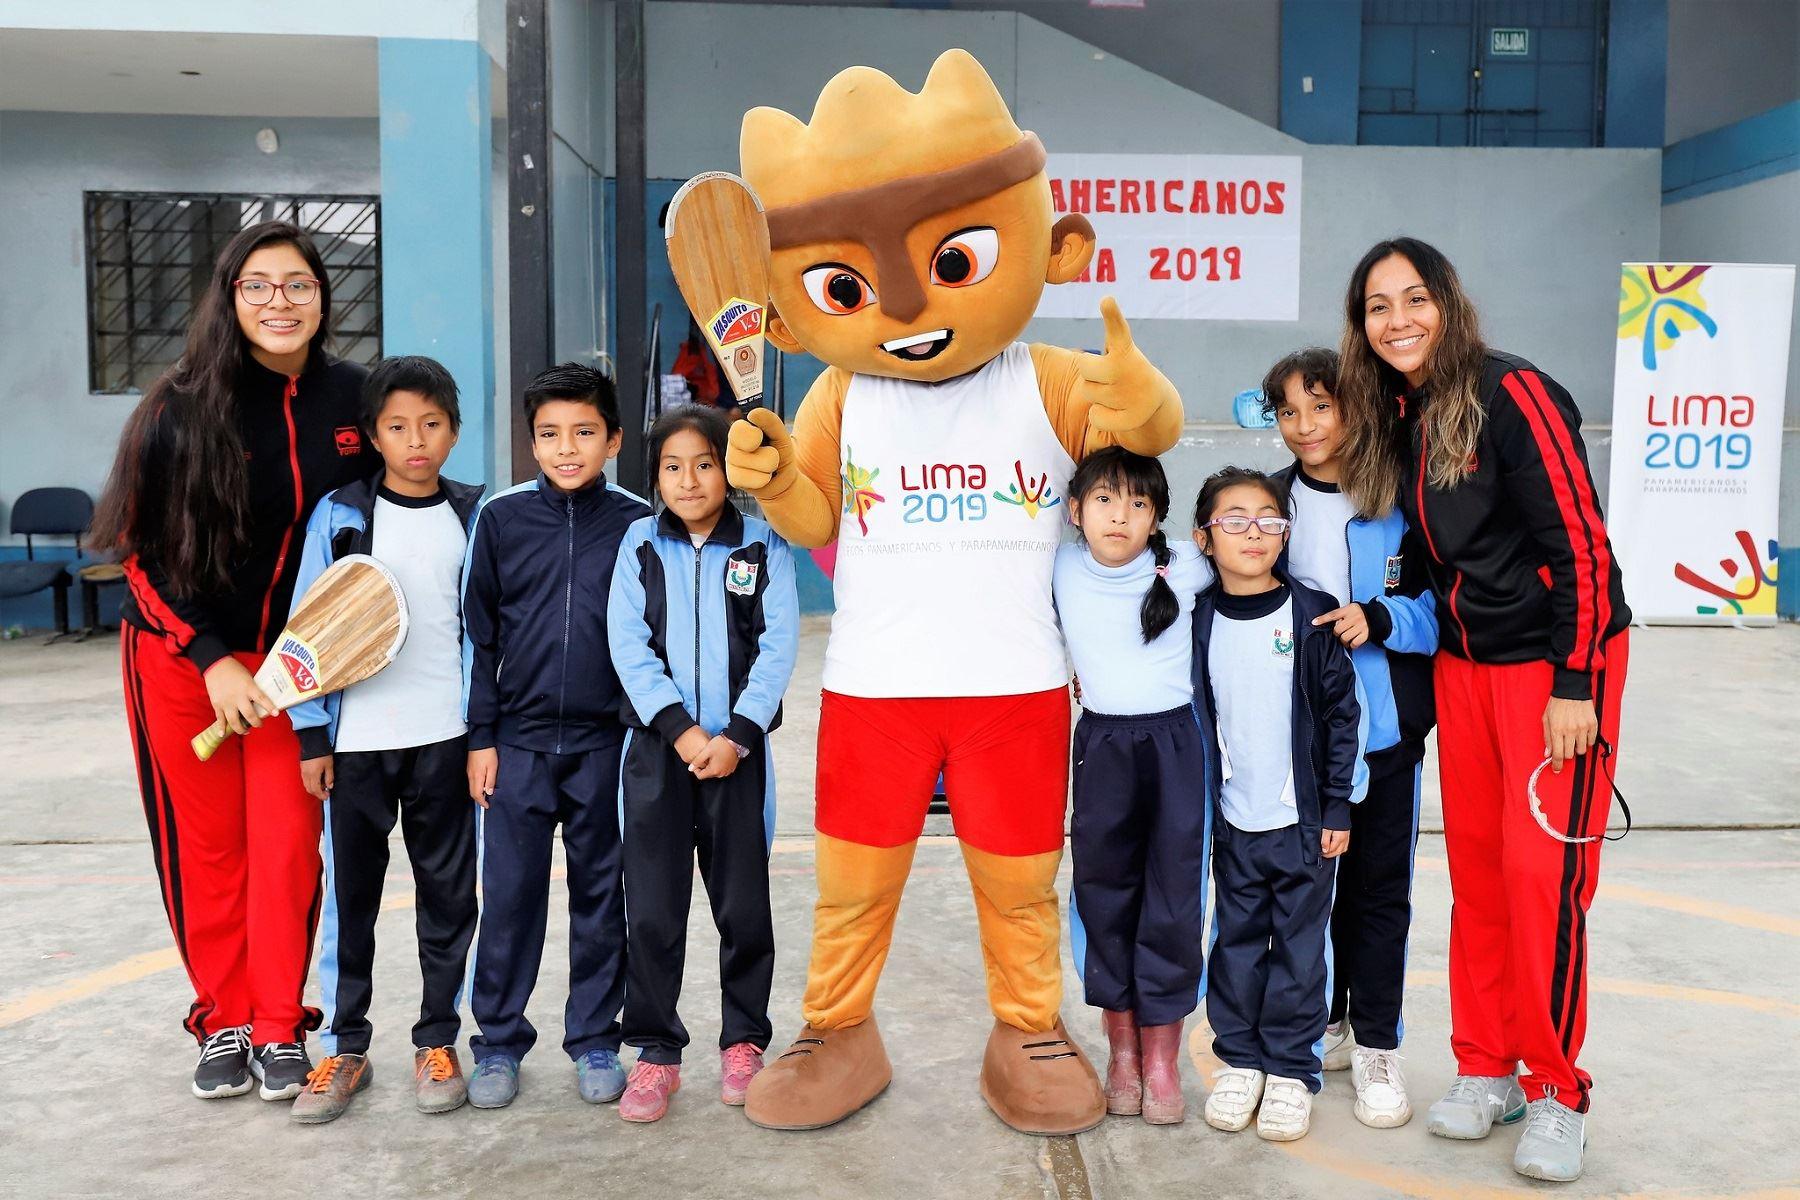 Escolares conocieron a deportistas peruanas de pelota vasca. Foto: Lima 2019.